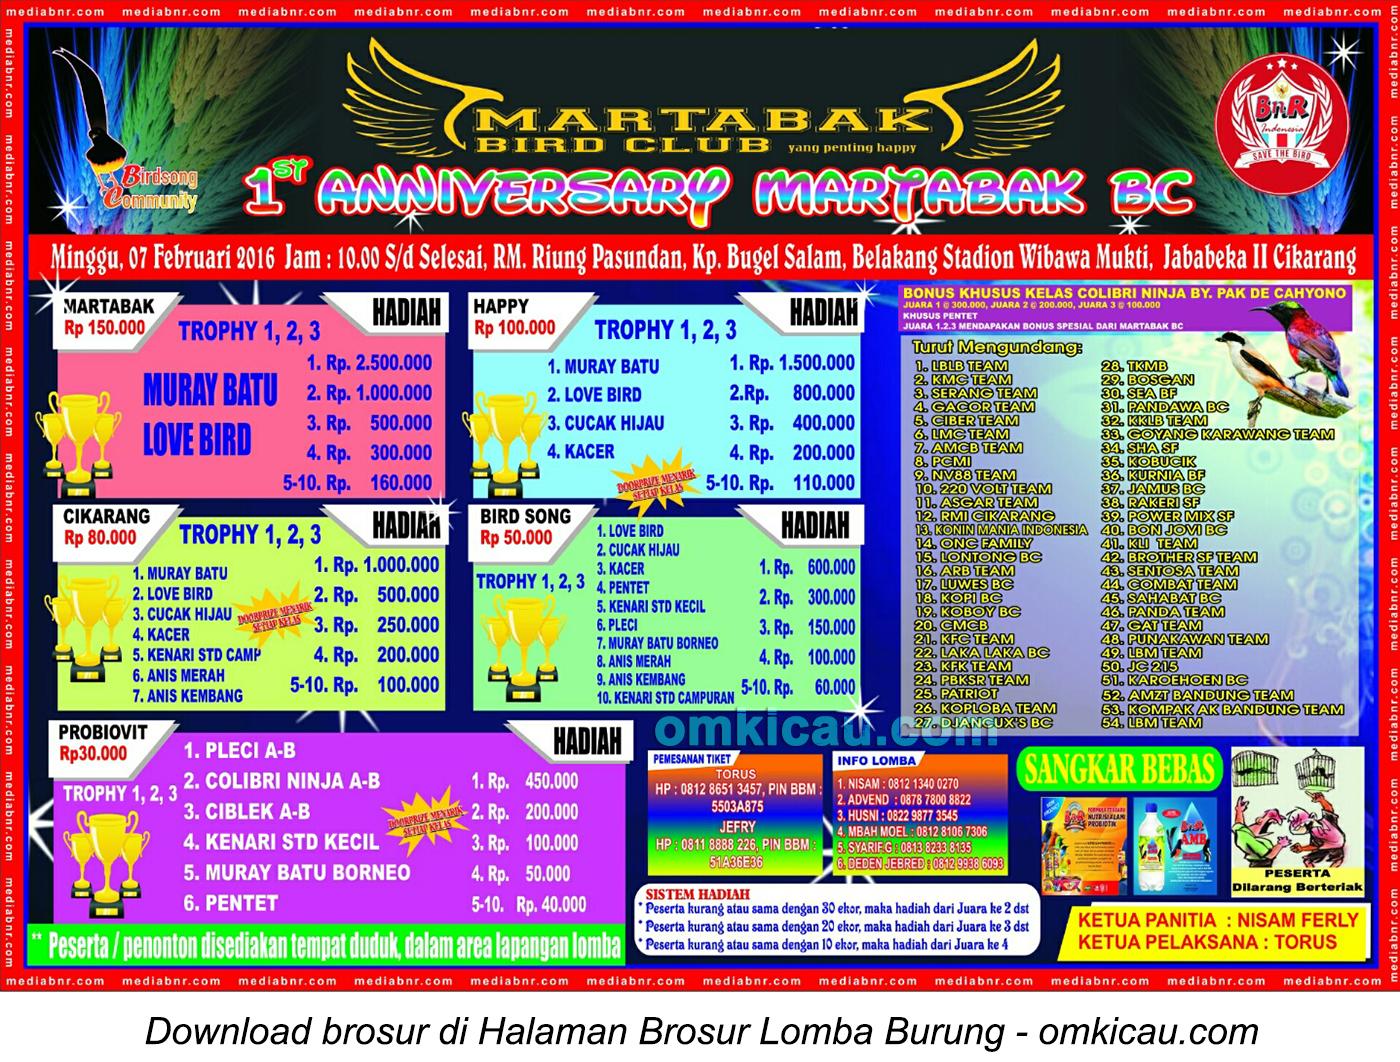 Brosur Lomba Burung Berkicau 1st Anniversary Martabak BC, Cikarang, 7 Februari 2016